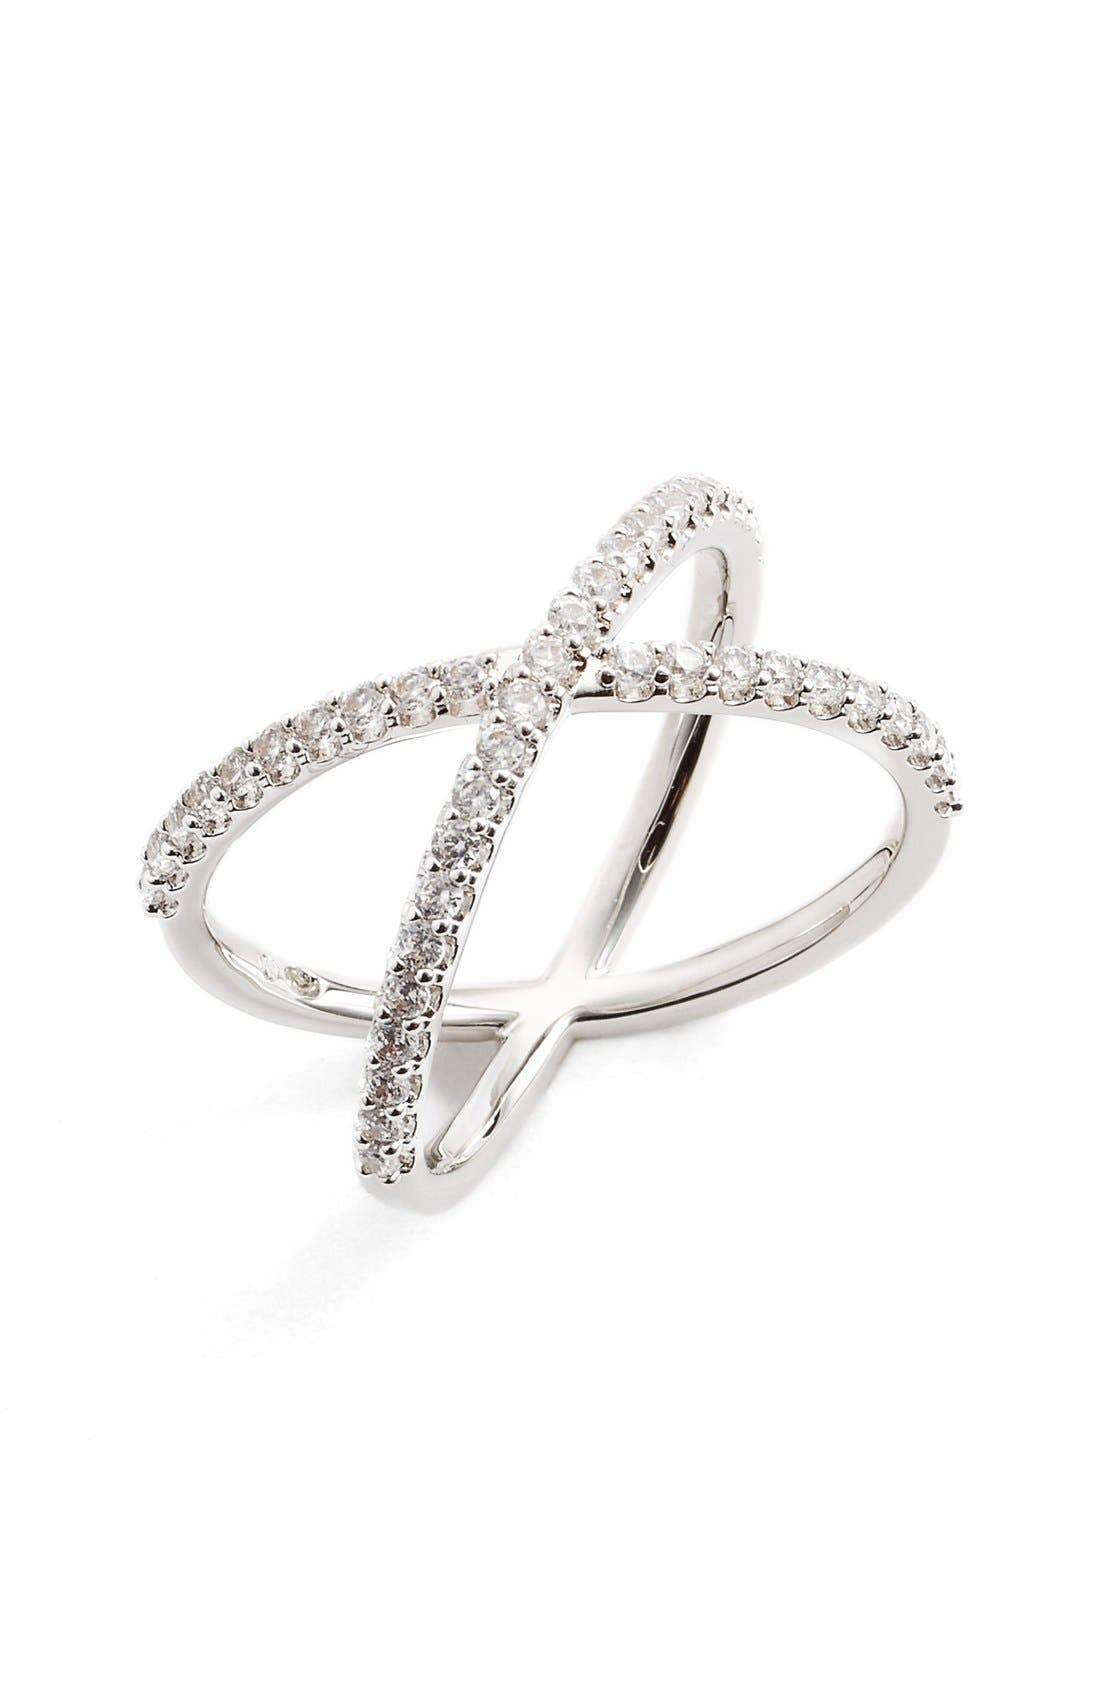 NADRI, Crossover Cubic Zirconia Ring, Main thumbnail 1, color, 040